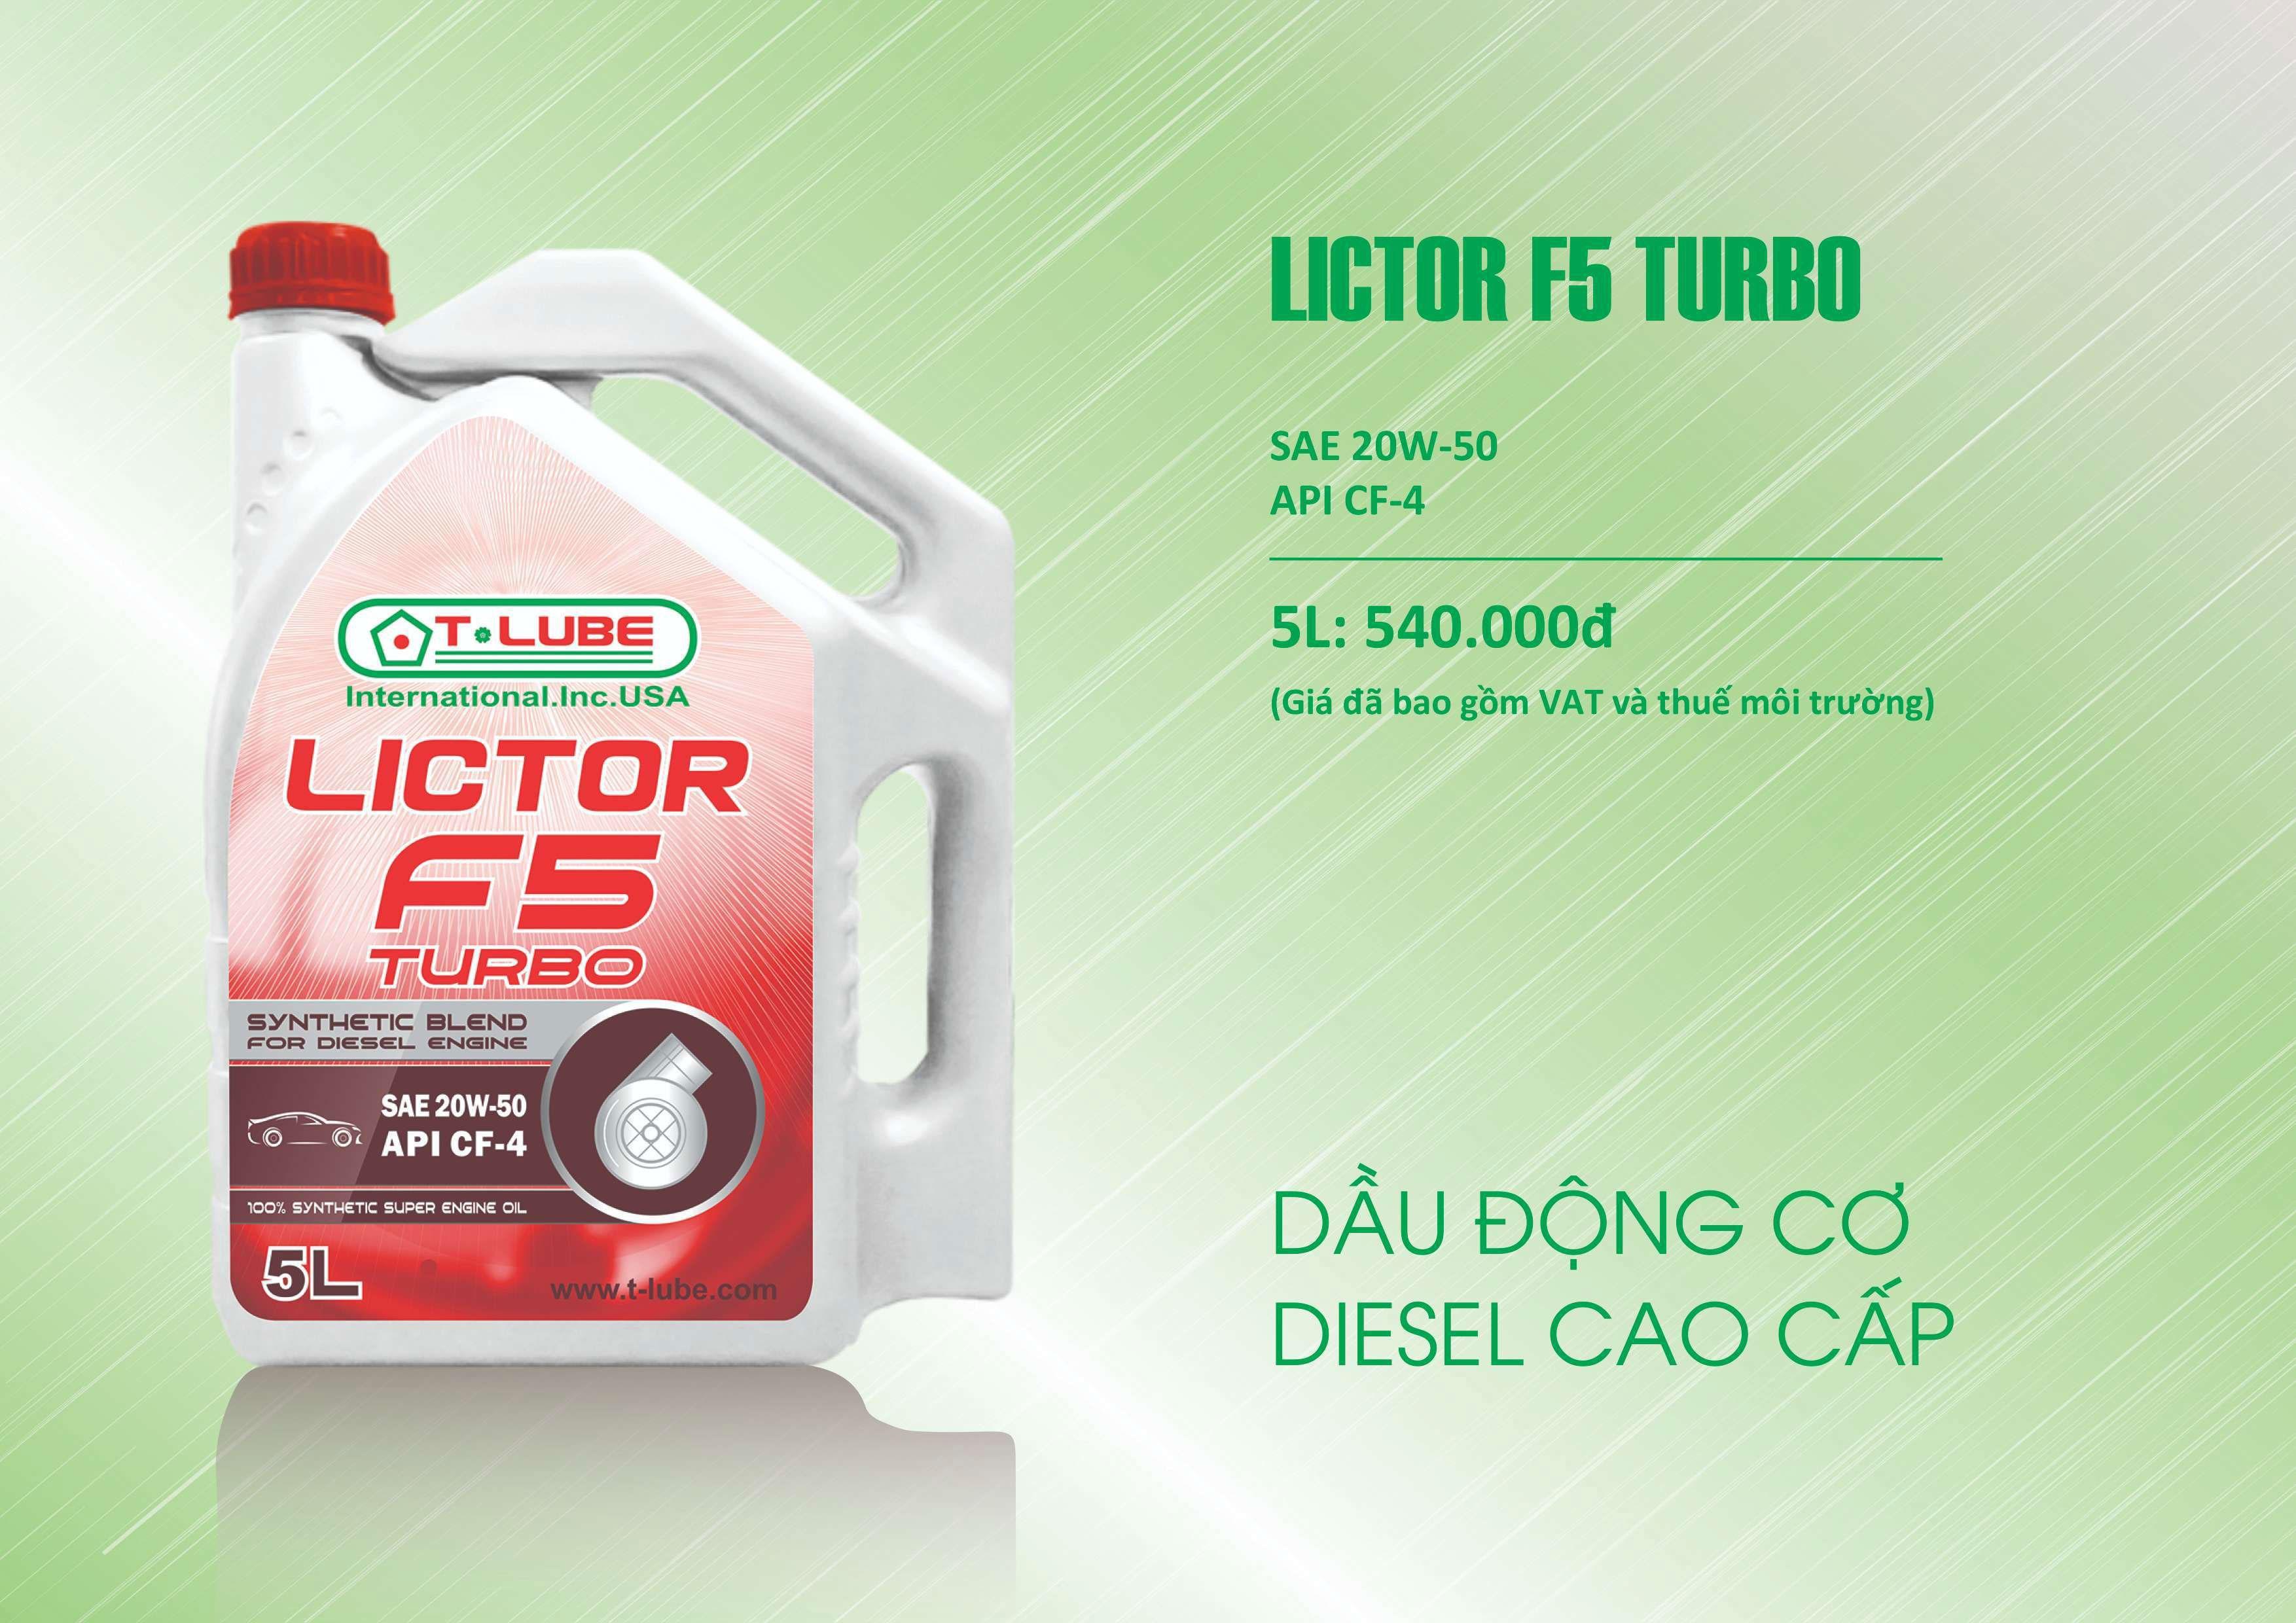 lictor f5 turbo